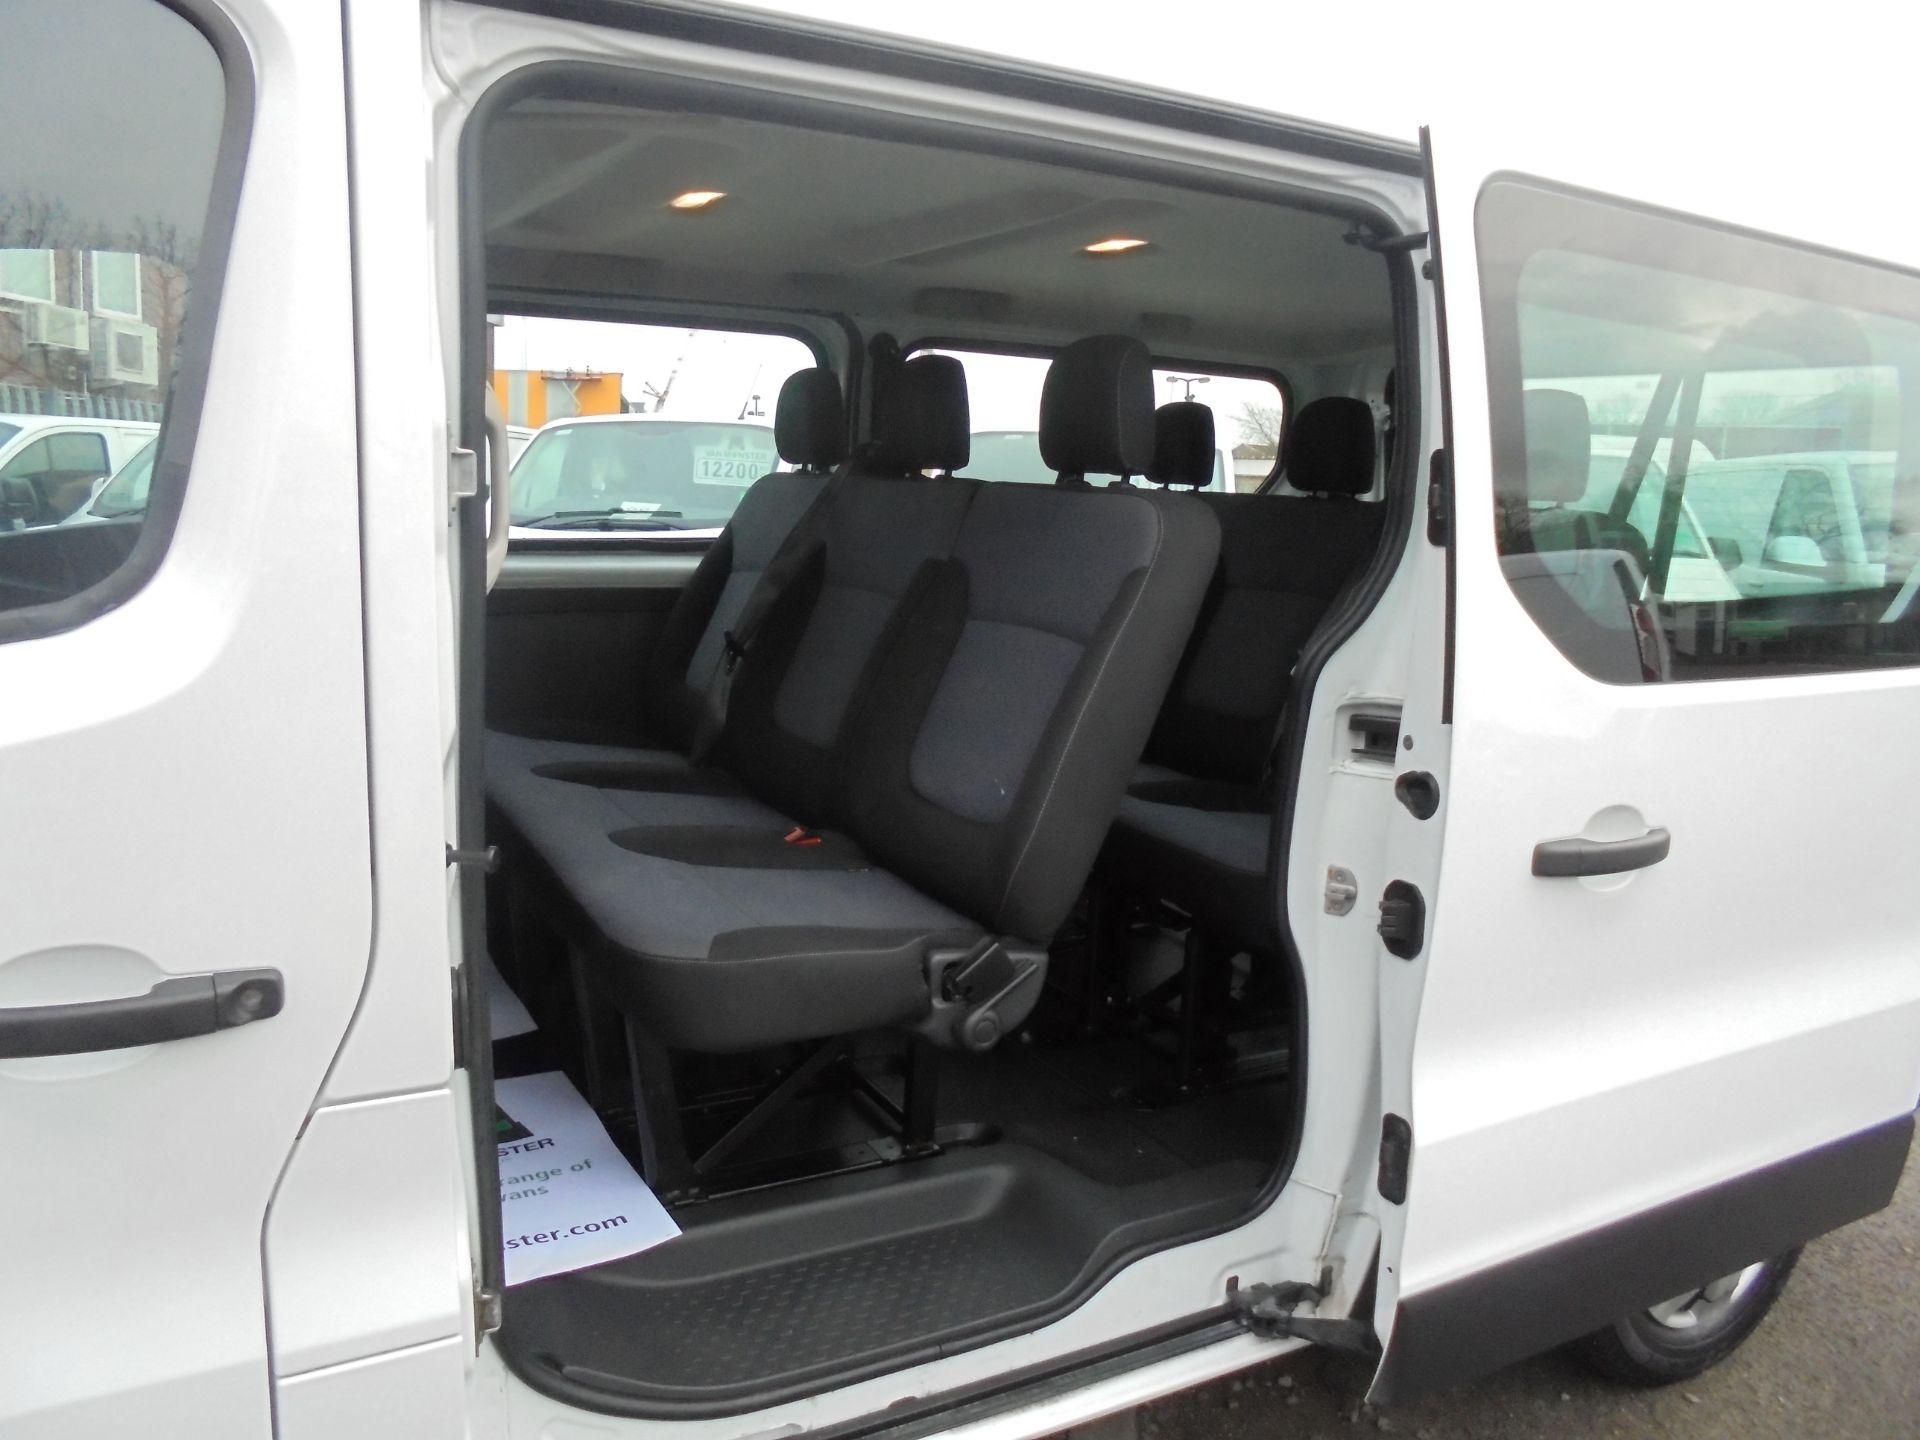 2017 Vauxhall Vivaro  L2 H1 2900 1.6 BITURBO 125PS ECOFLEX COMBI 9 SEAT EURO 6 (DX17VWC) Image 9